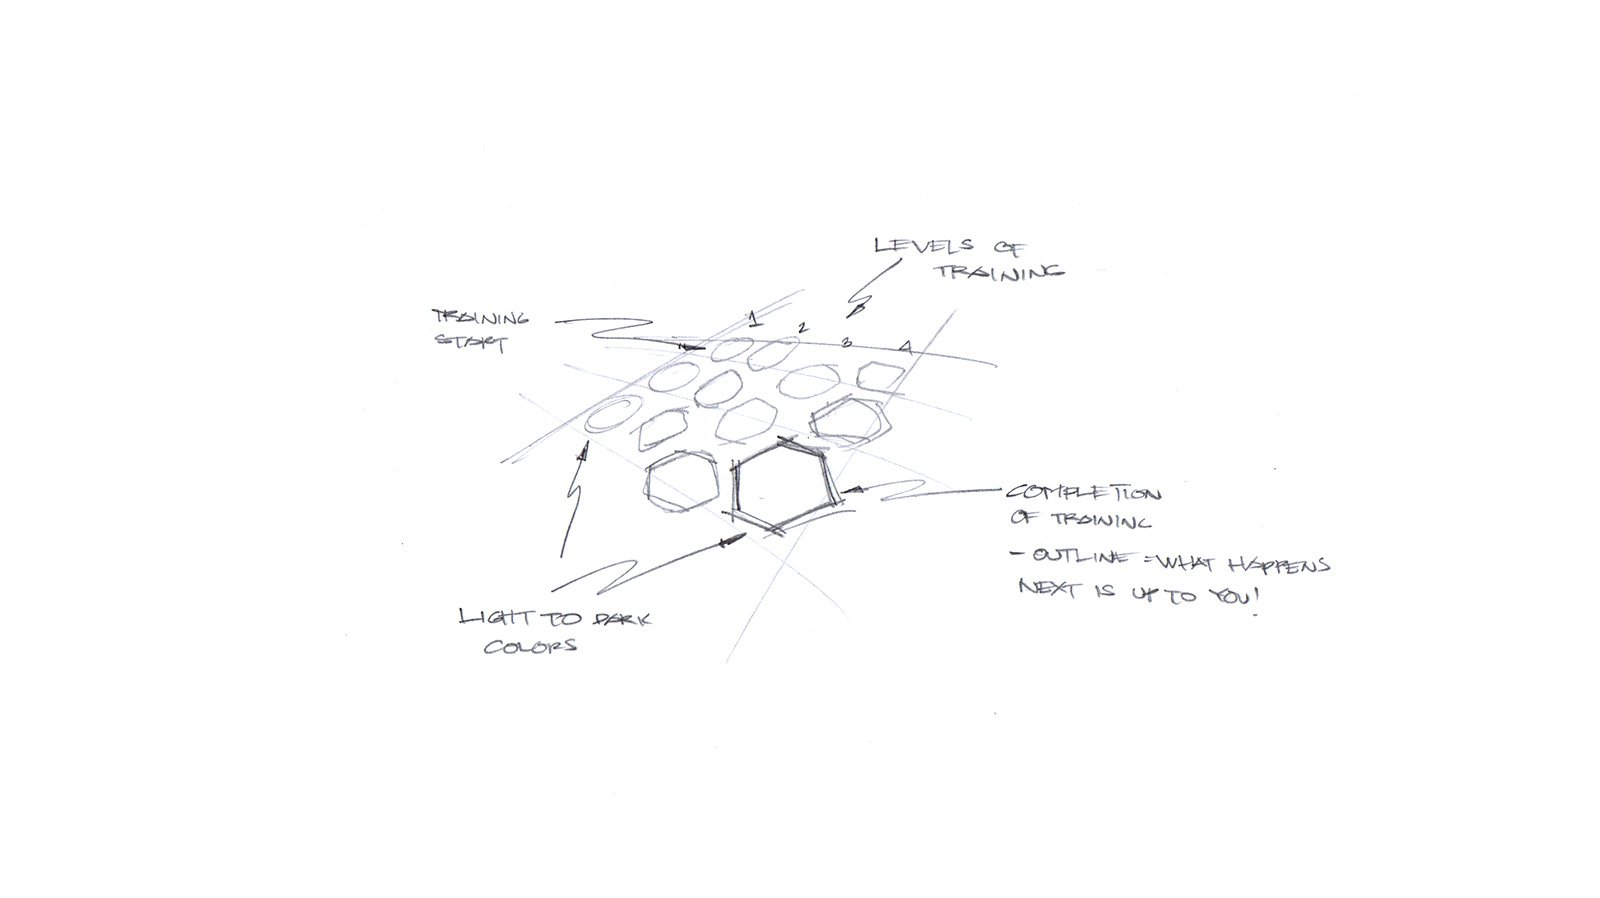 JFC CAMP Sketch